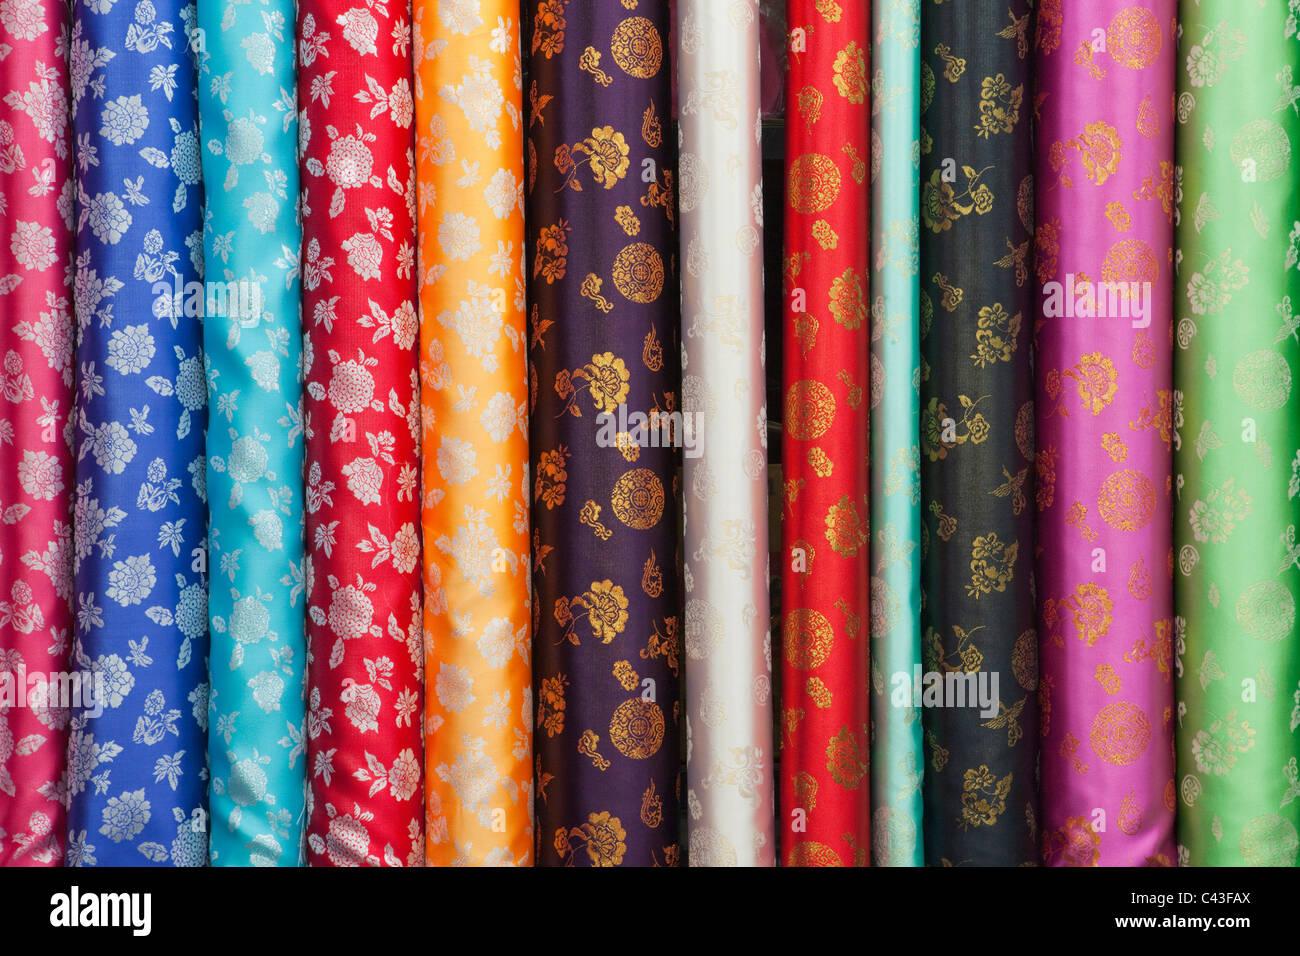 Asia, Korea, Seoul, Dongdaemun Market, Fabric Shop, Fabric, Material, Silk, Silks, Shop, Shopping, Market, Markets, Tourism, Tra Stock Photo